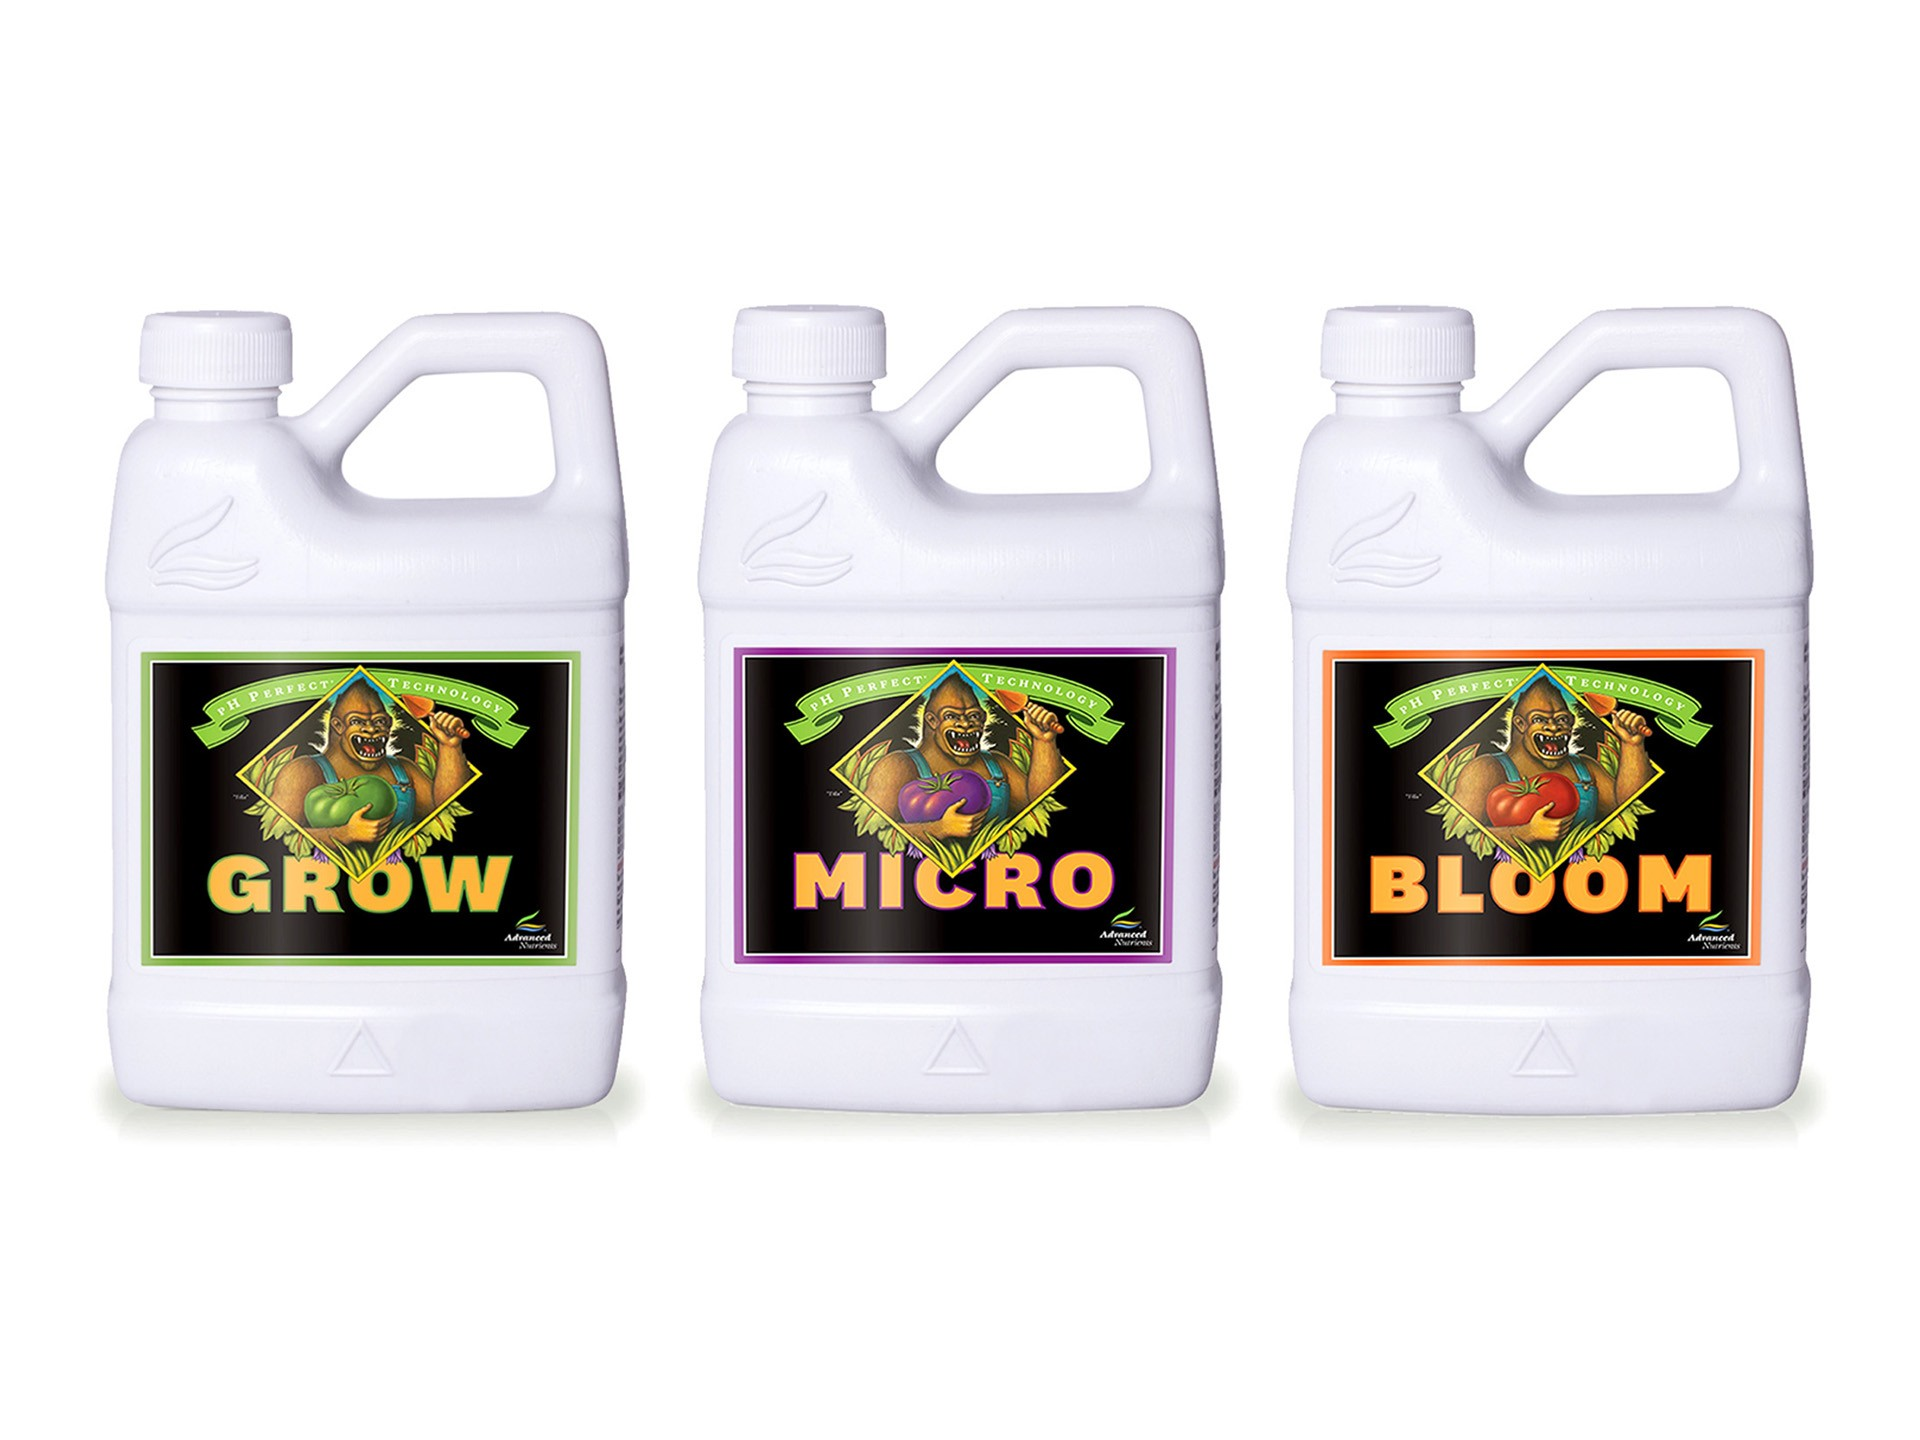 TryPack Grow/Micro/Bloom 1500ml